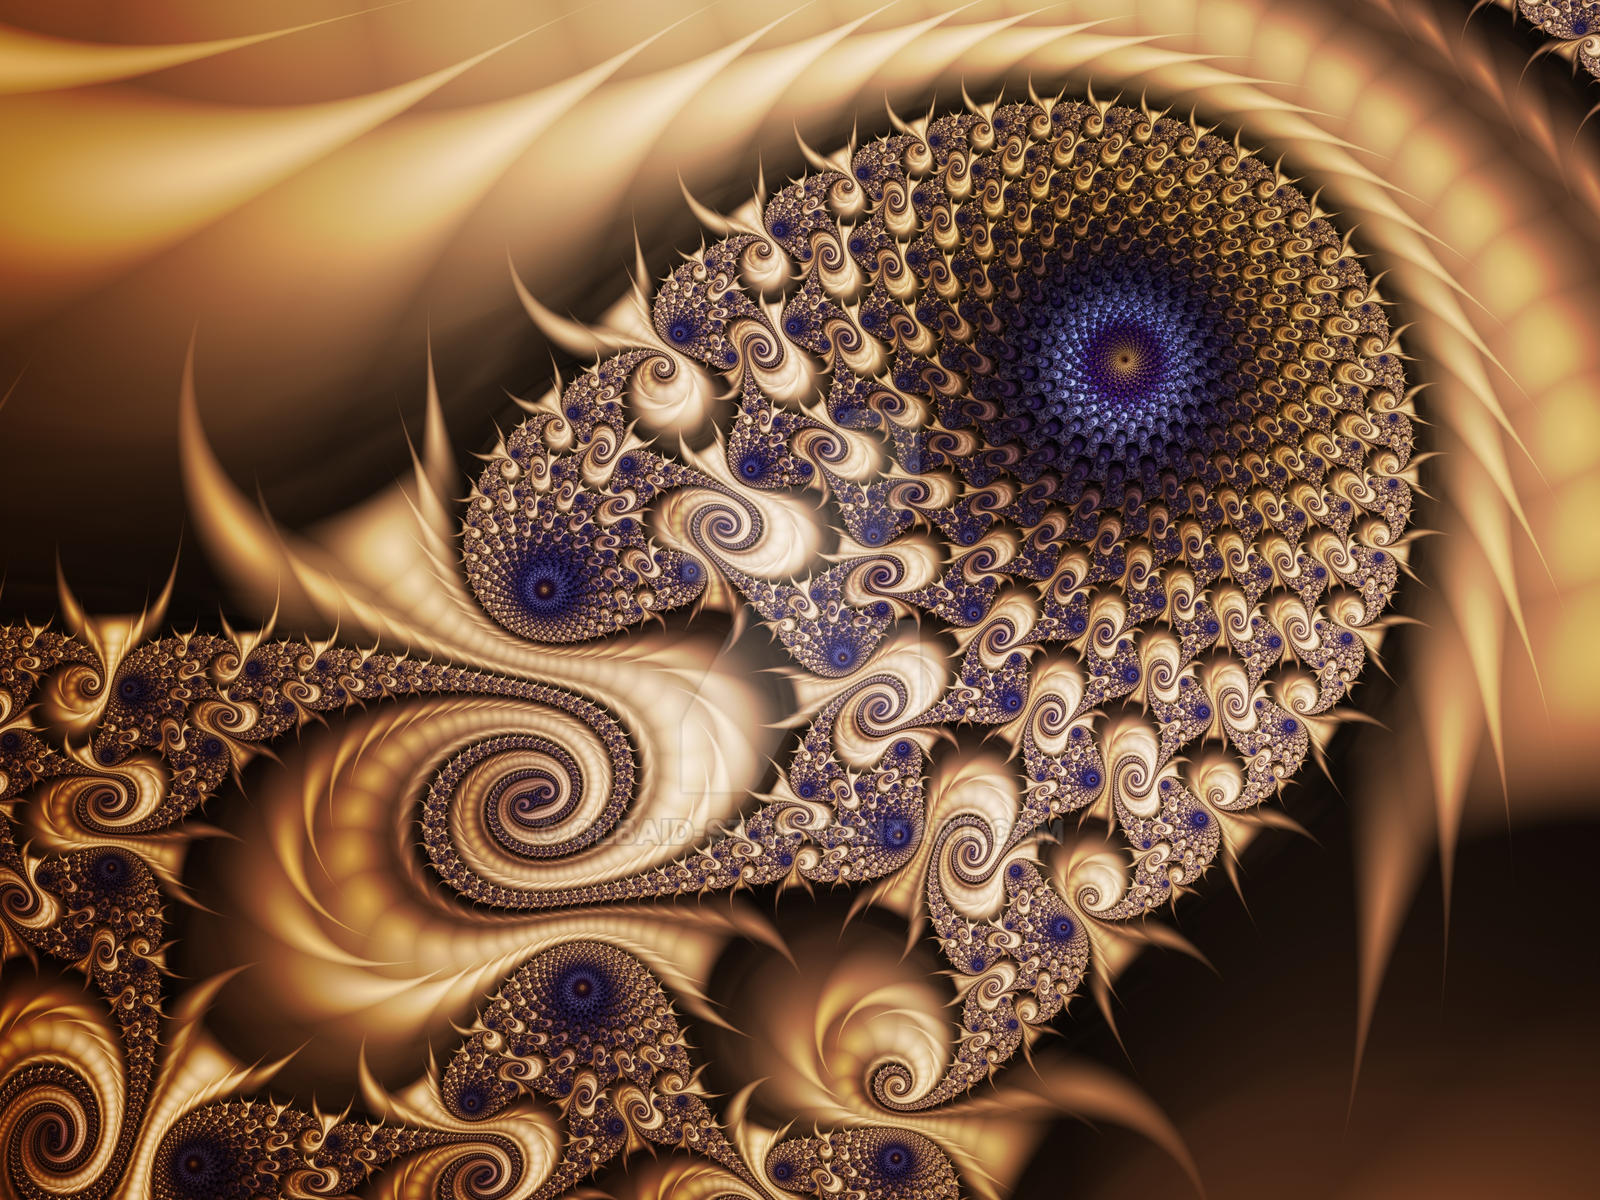 Mandelbrot 53  - Desert Eye - by Olbaid-ST